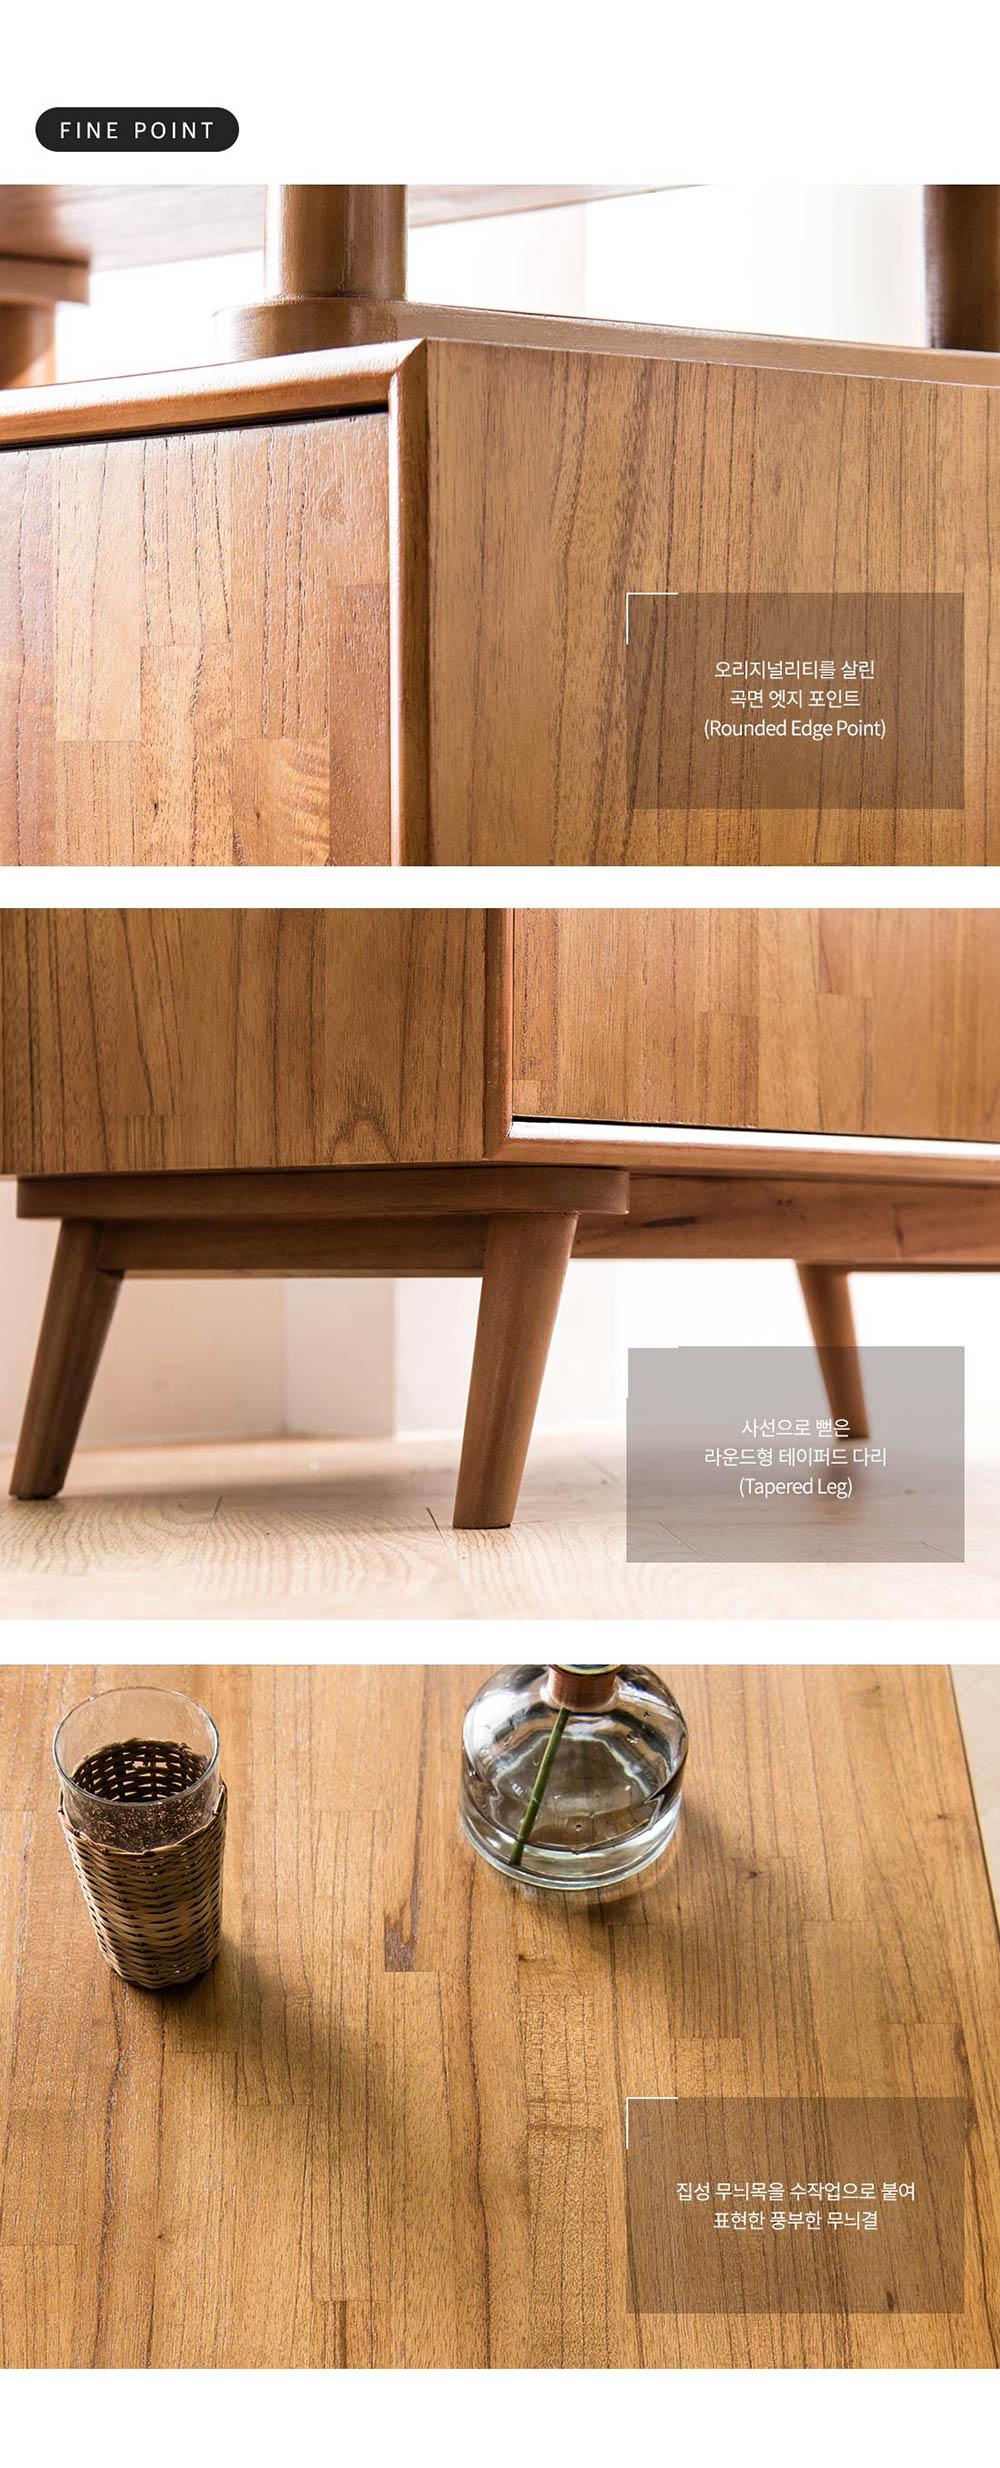 New_Retro_TV_Console_Details_1_Furniture_Online_Singapore_born_in_colour